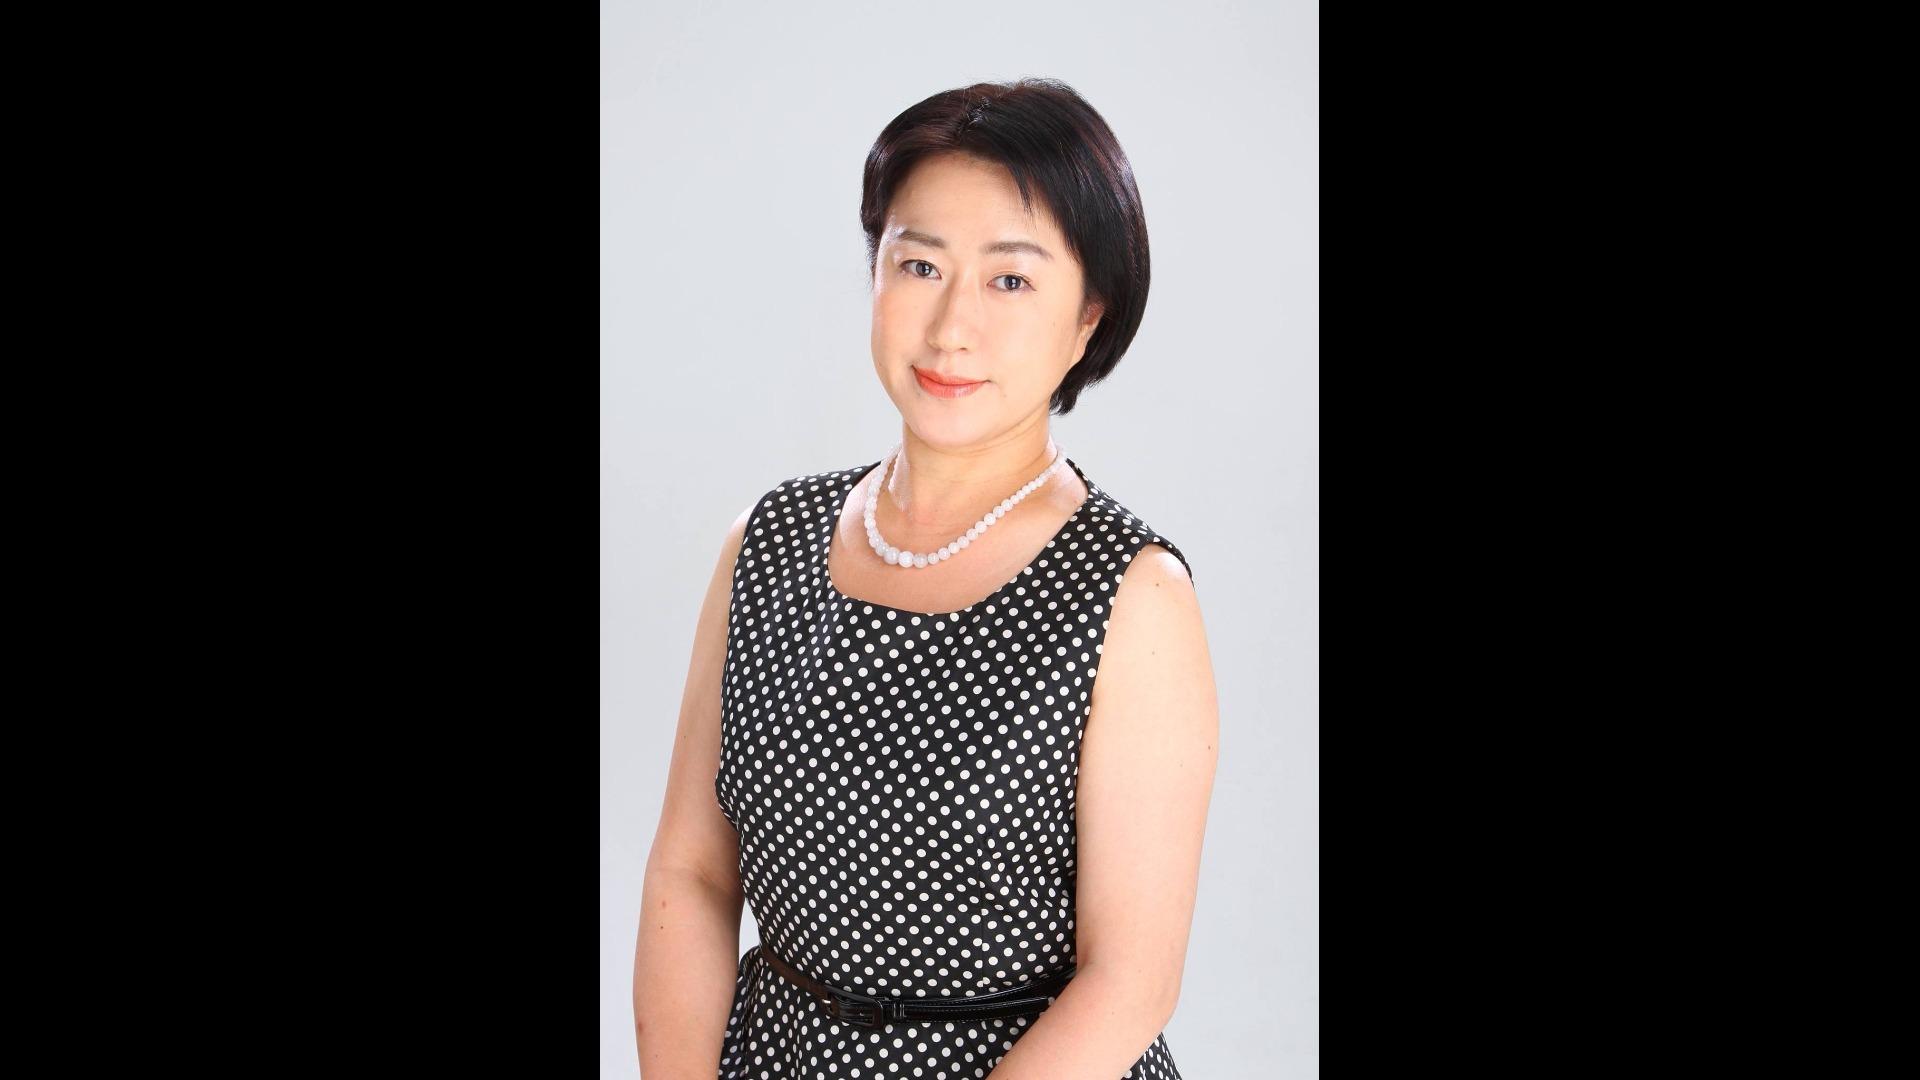 一般社団法人エメラルド倶楽部 代表理事 菅原智美